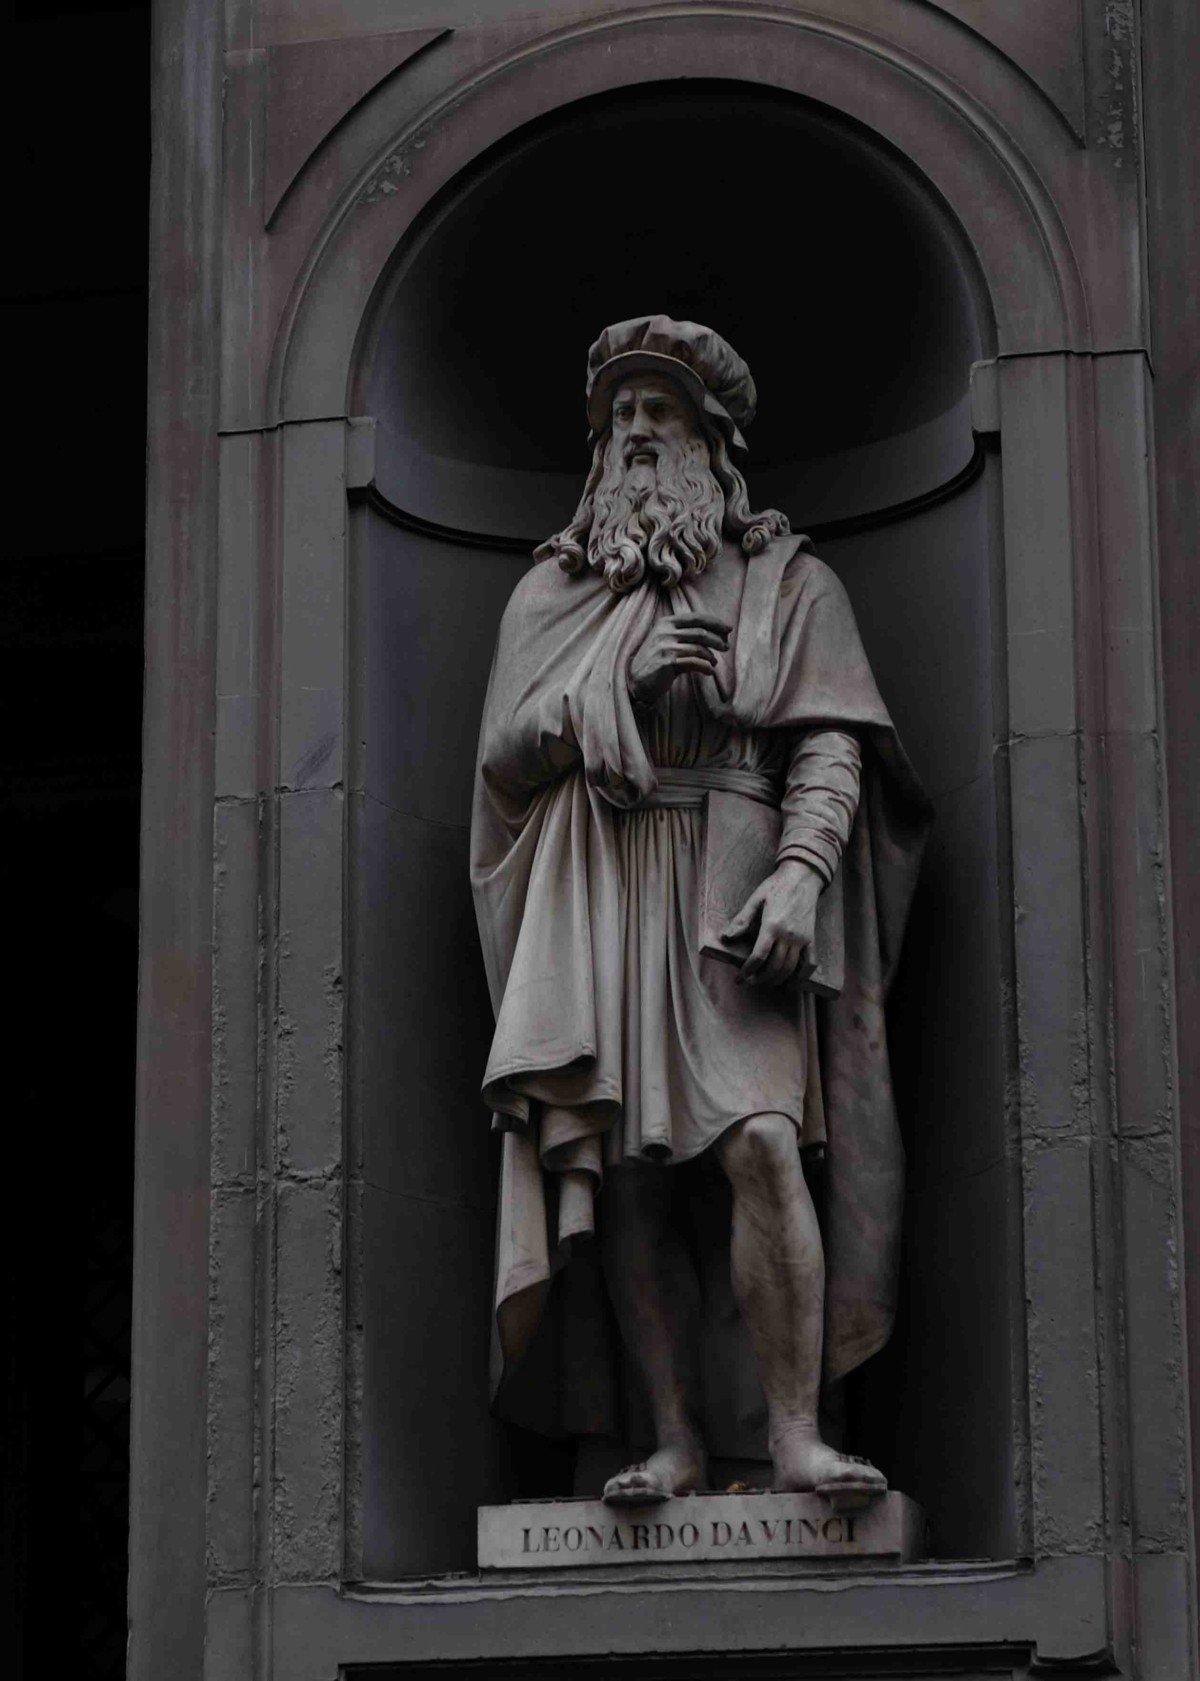 Leonardo D vinci The Uffizi Gallery